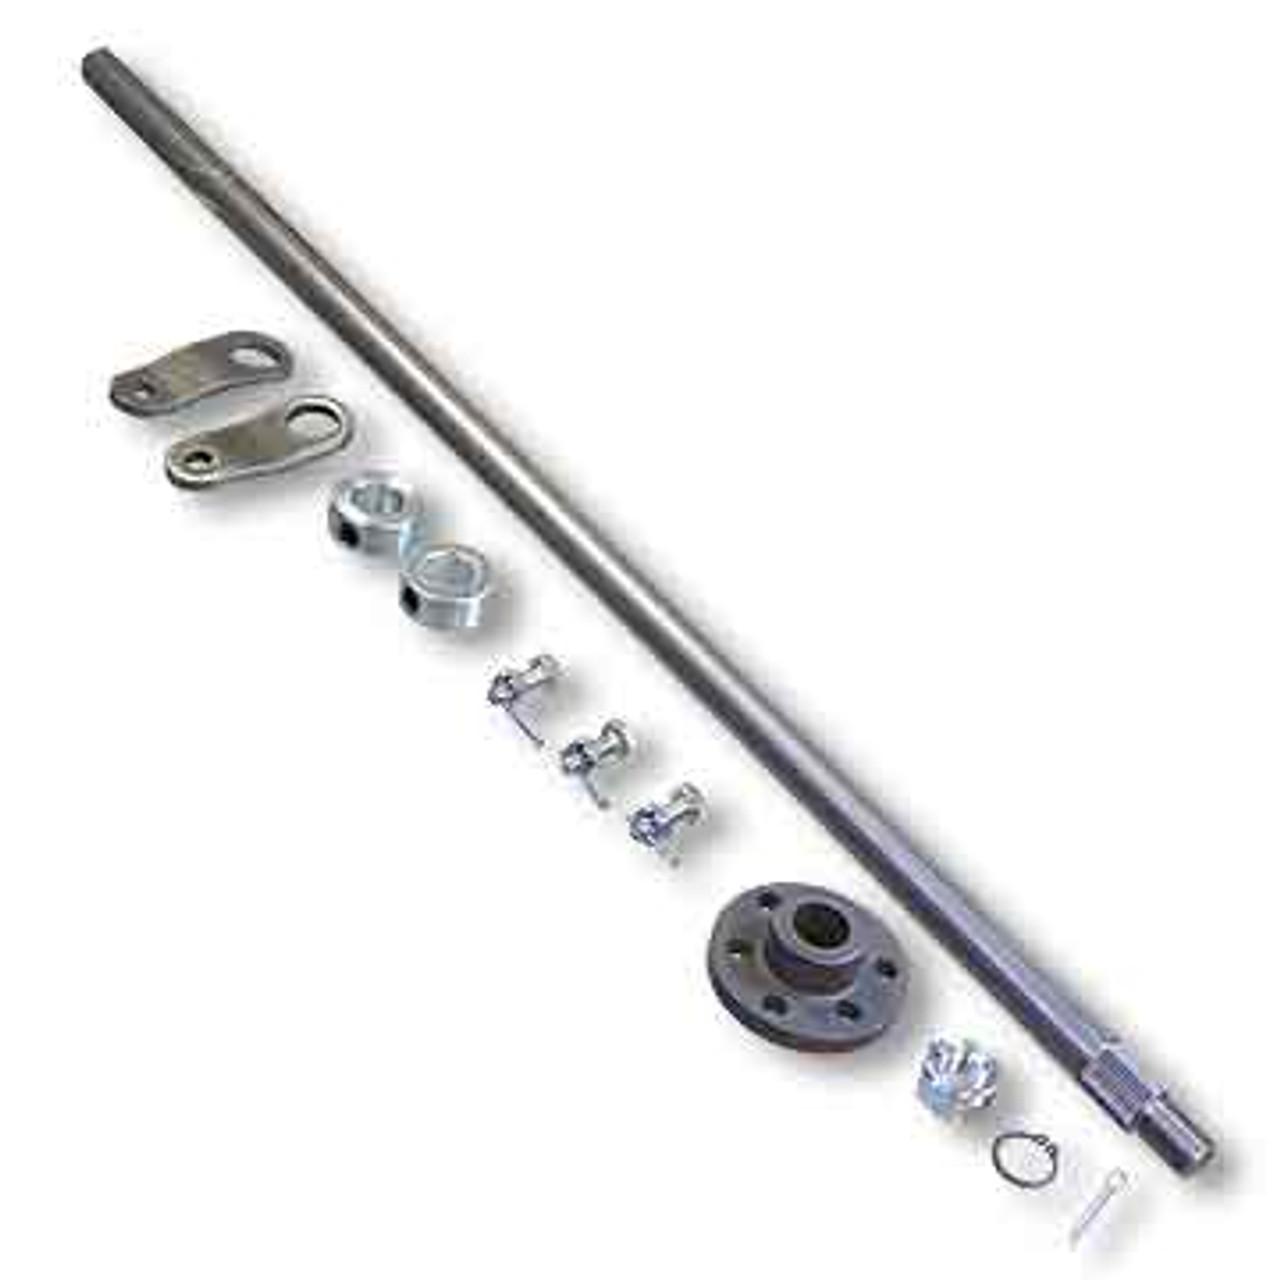 "Steering Shaft, 5/8"" OD & Hub Kit, Unwelded Pitman Arms, 28"" Length"